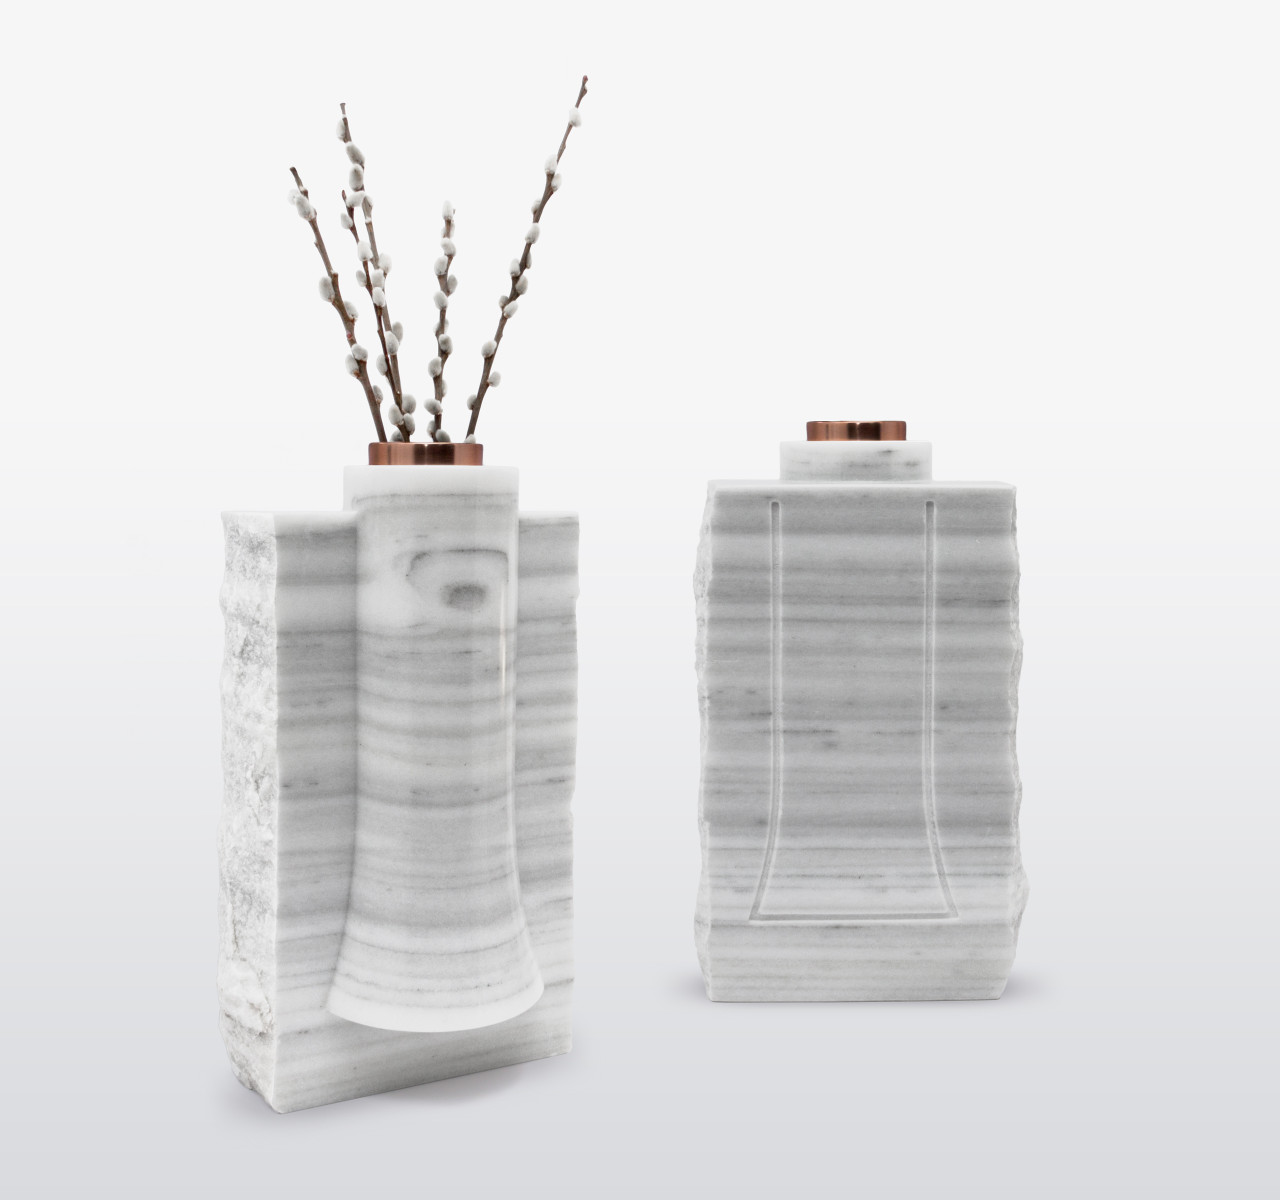 The Angel Vase by Ahsayane Studio